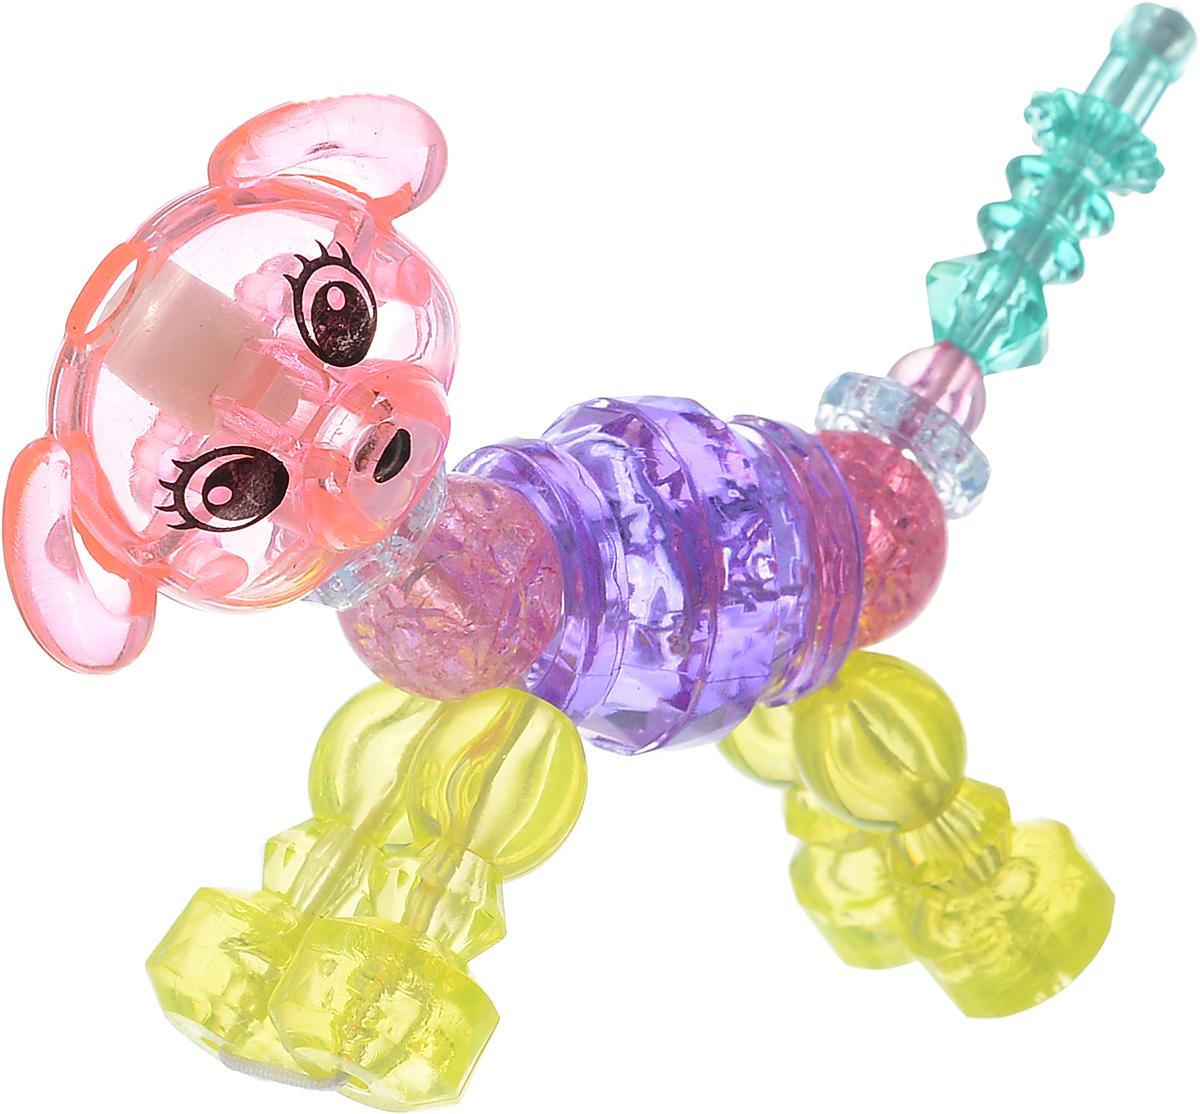 цена Аксессуар для кукол Junfa Toys Браслеты волшебные Jewelry Pets, ZY863977 онлайн в 2017 году